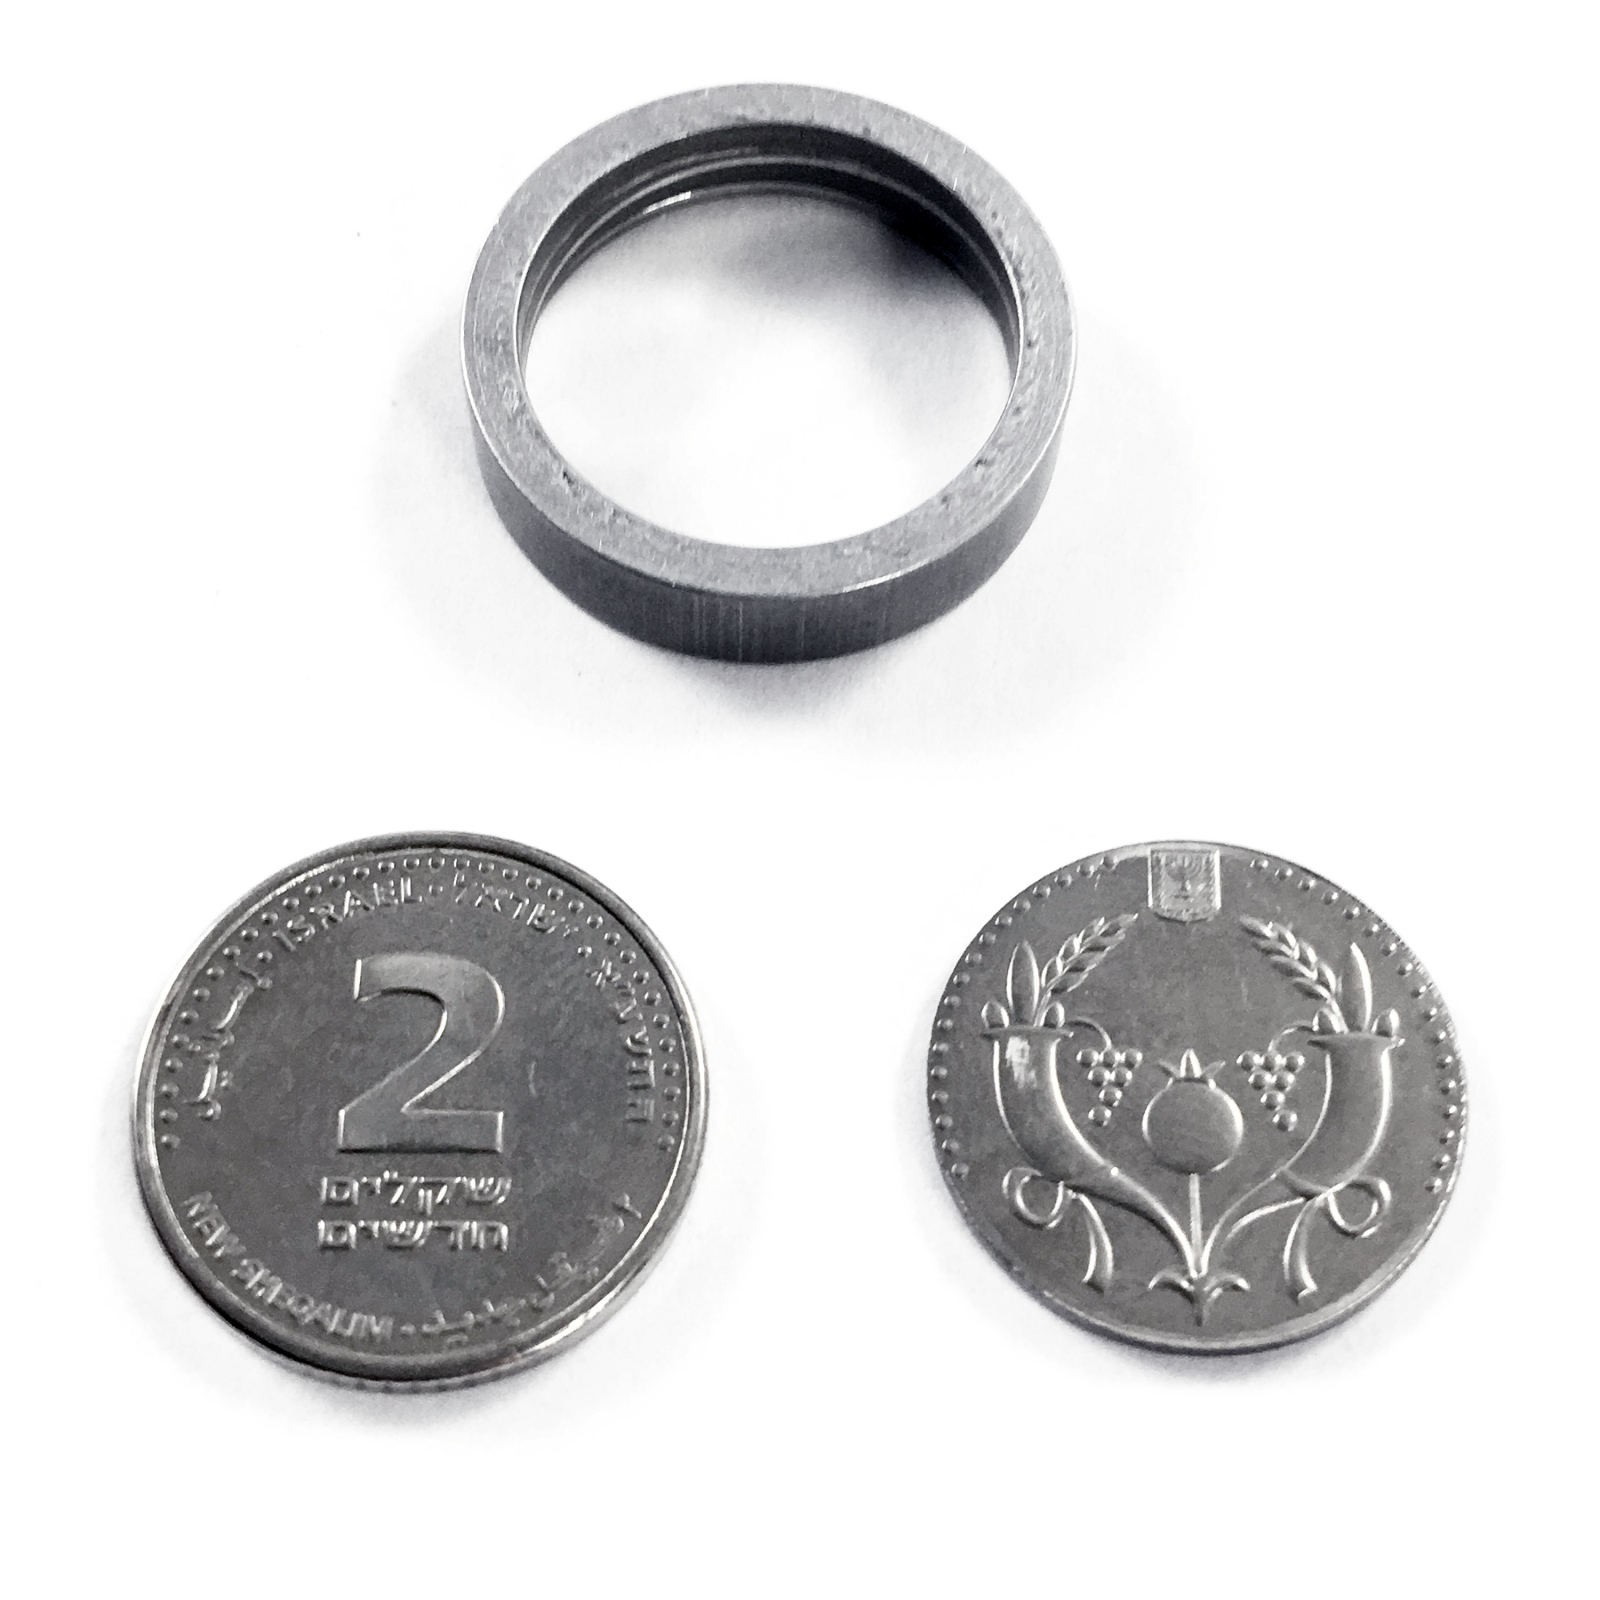 MicroSD Hidden Hollow Covert Spy Coin - Authentic International Mint, Israeli 2 Shekel